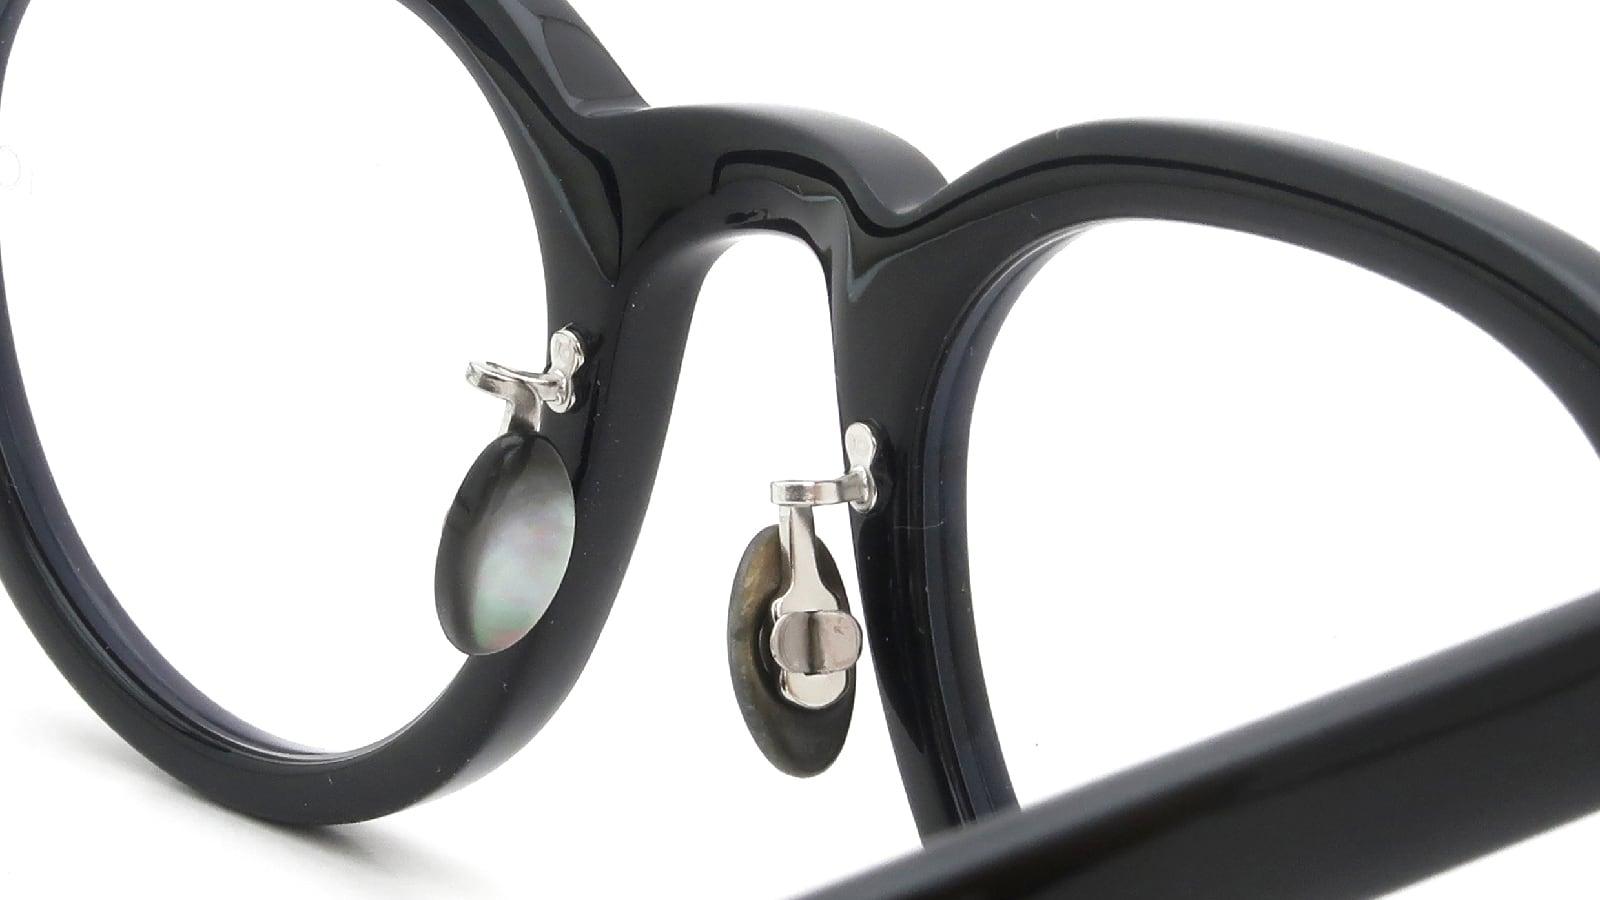 10 eyevan NO.6 Ⅲ FR 46size c.1002S Black 8